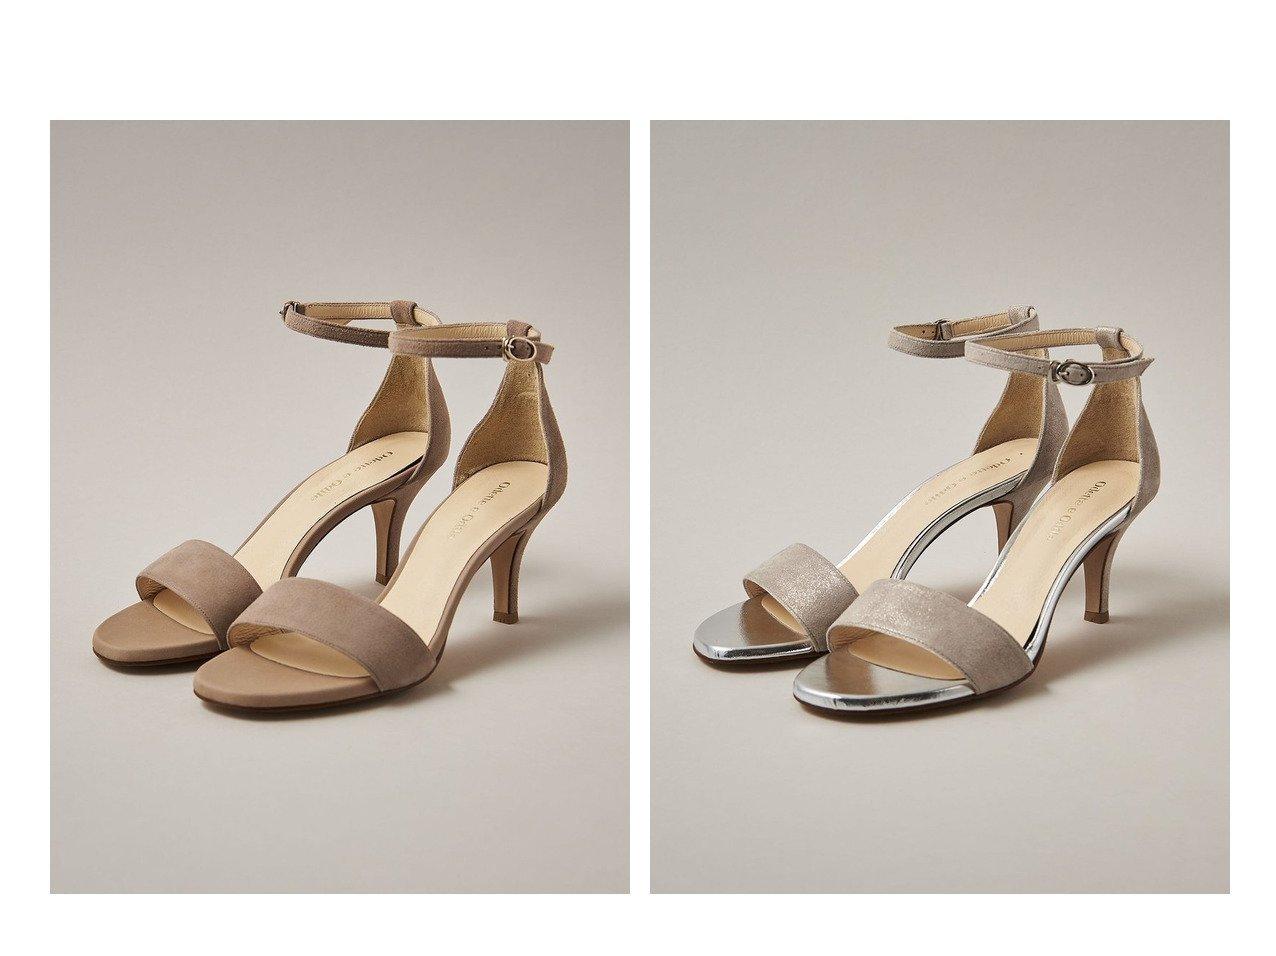 【Odette e Odile/オデット エ オディール】のOFD アンクルストラップ サンダル70↓↑ 【シューズ・靴】おすすめ!人気、トレンド・レディースファッションの通販  おすすめで人気の流行・トレンド、ファッションの通販商品 インテリア・家具・メンズファッション・キッズファッション・レディースファッション・服の通販 founy(ファニー) https://founy.com/ ファッション Fashion レディースファッション WOMEN アンクル サンダル シューズ シンプル ストラップサンダル ミュール 人気 |ID:crp329100000053893